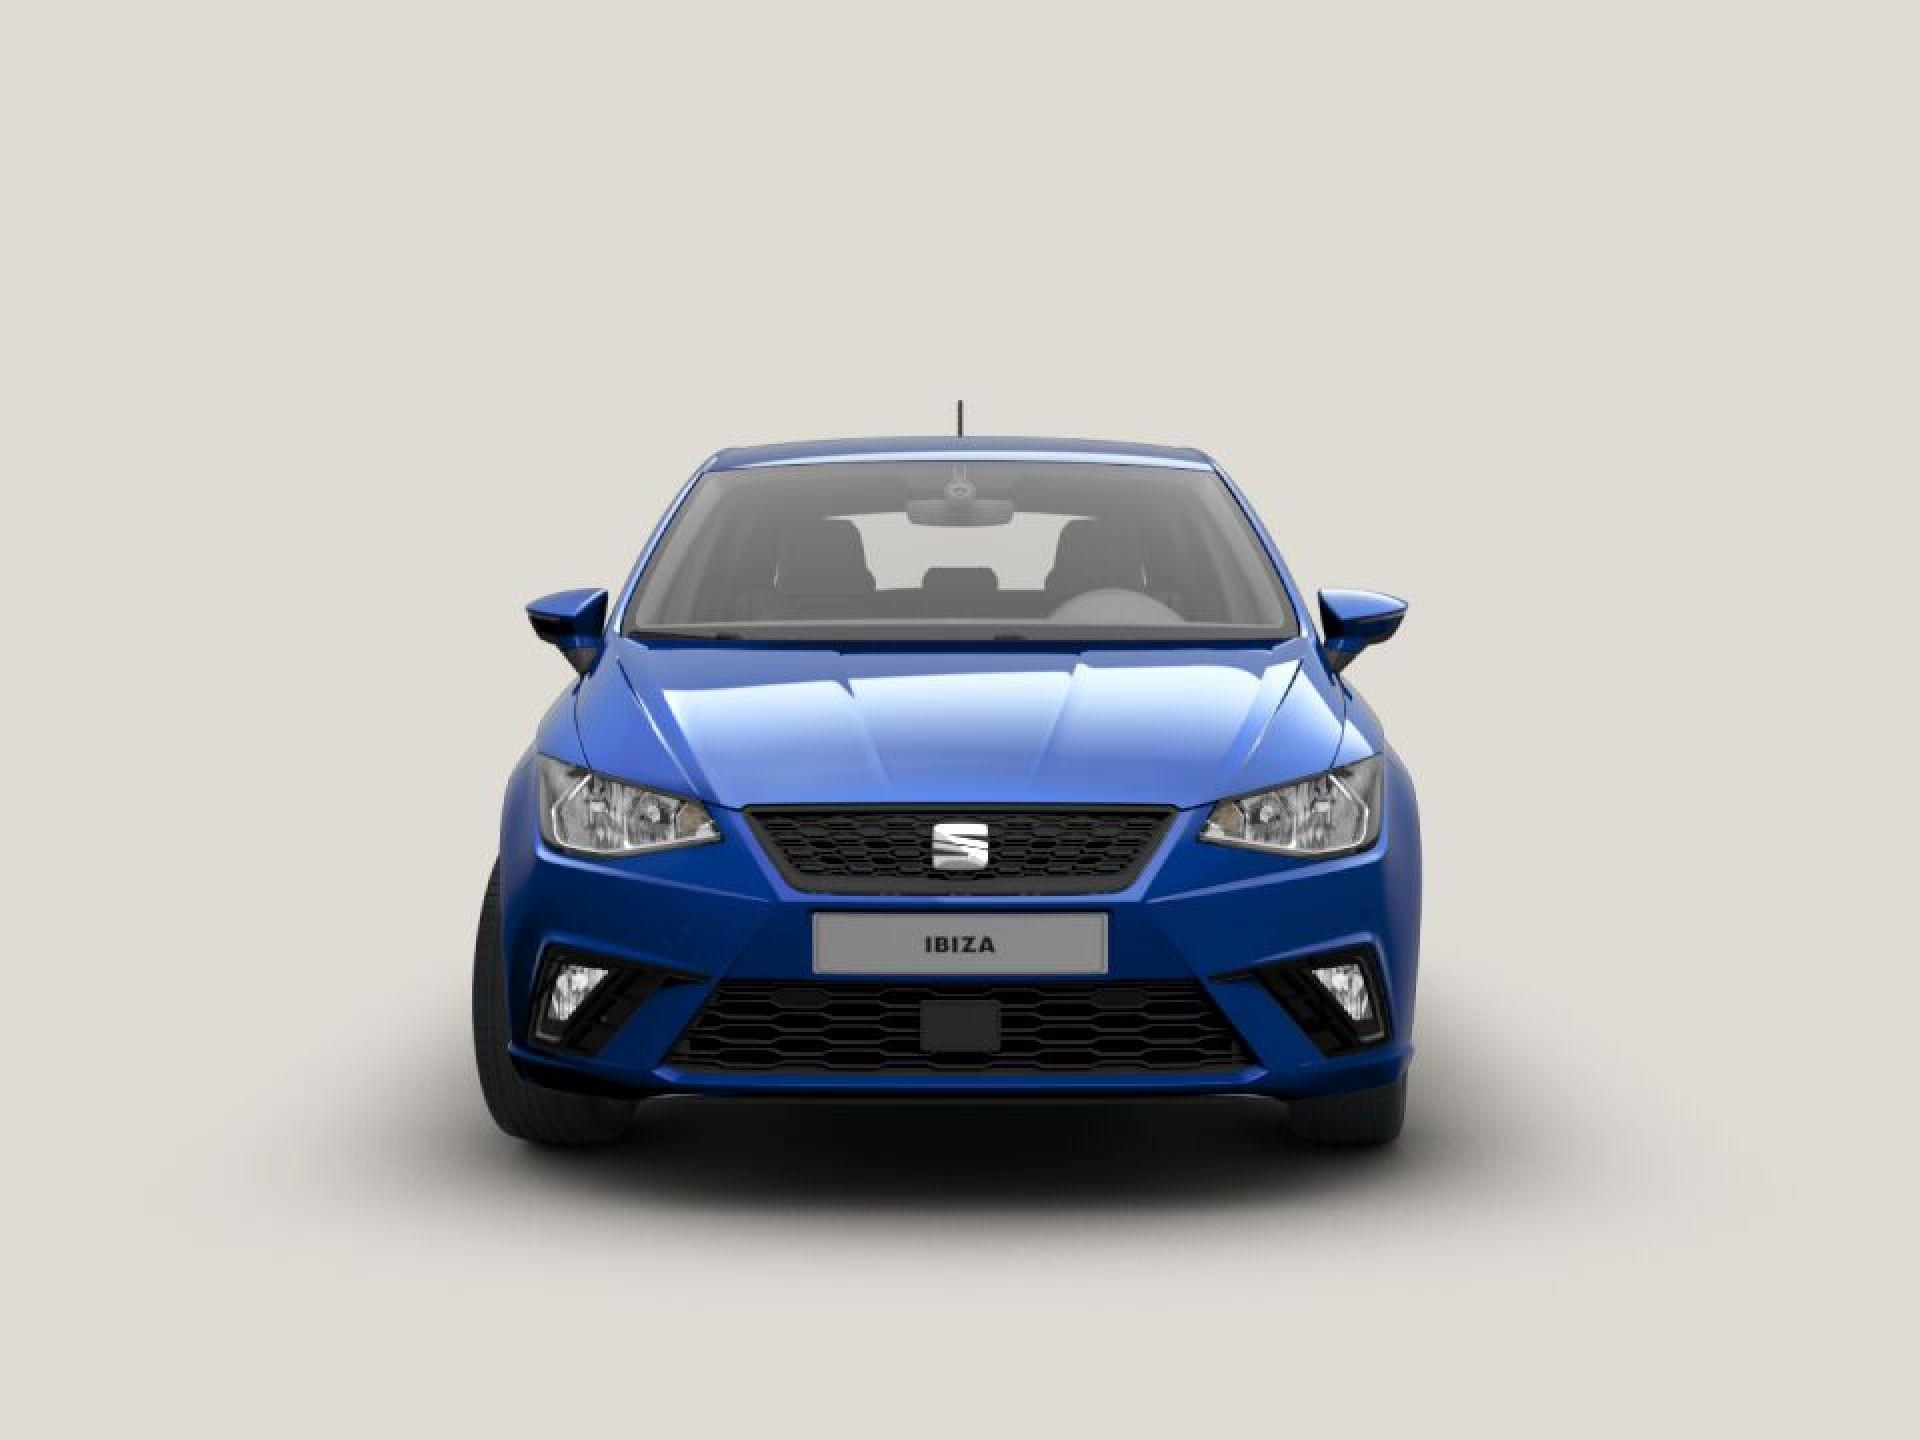 SEAT Ibiza 1.0 TSI 70kW (95CV) Style Plus nuevo Madrid